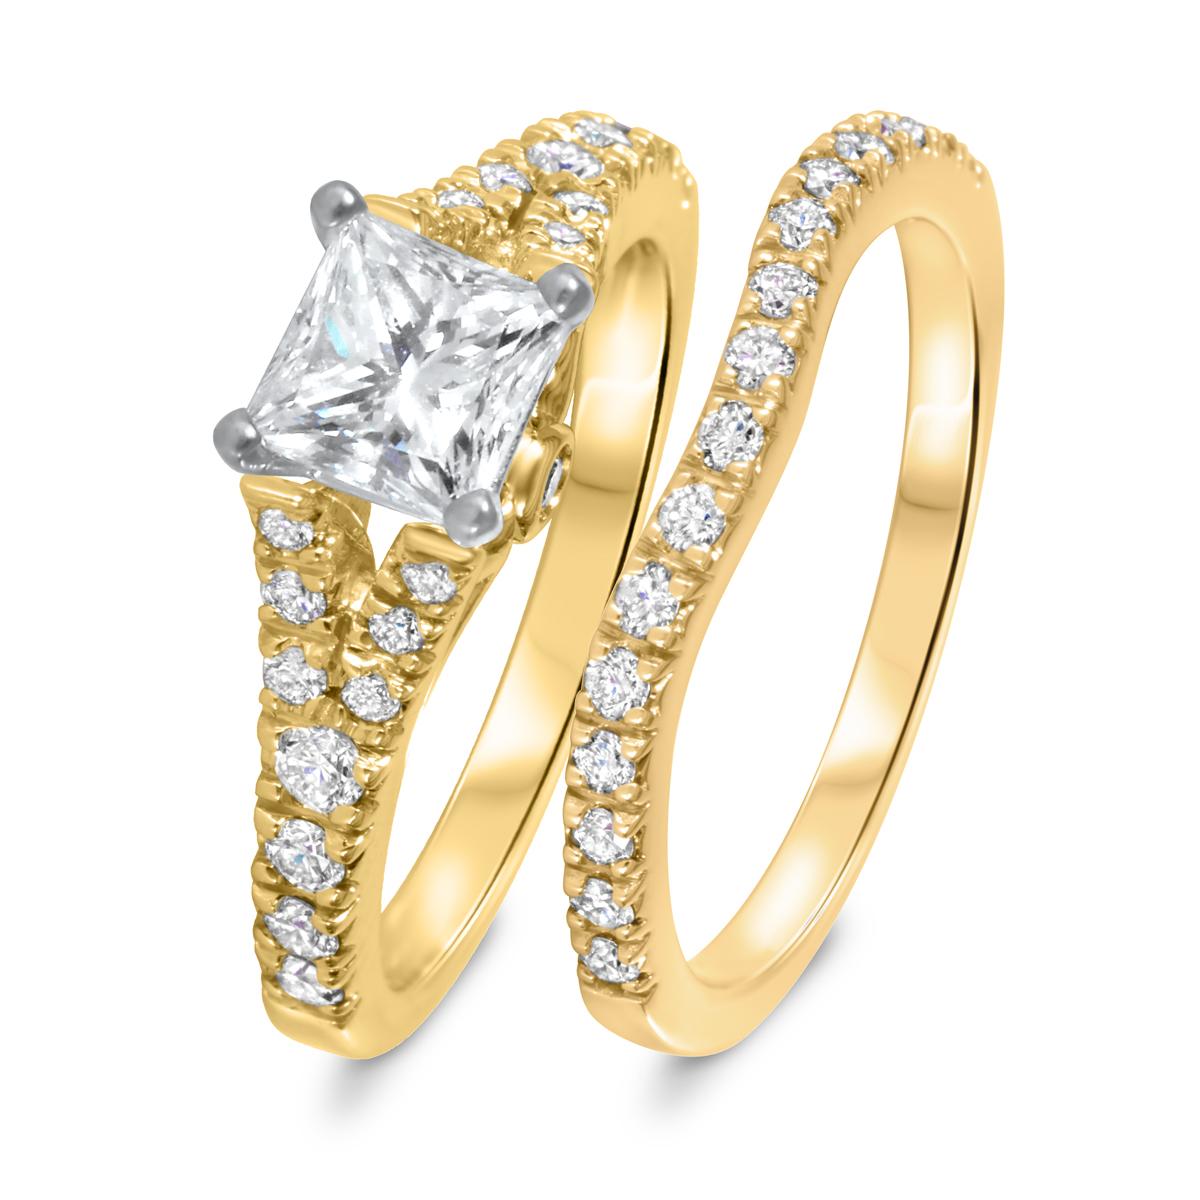 1 3/4 CT. T.W. Diamond Women's Bridal Wedding Ring Set 14K Yellow Gold